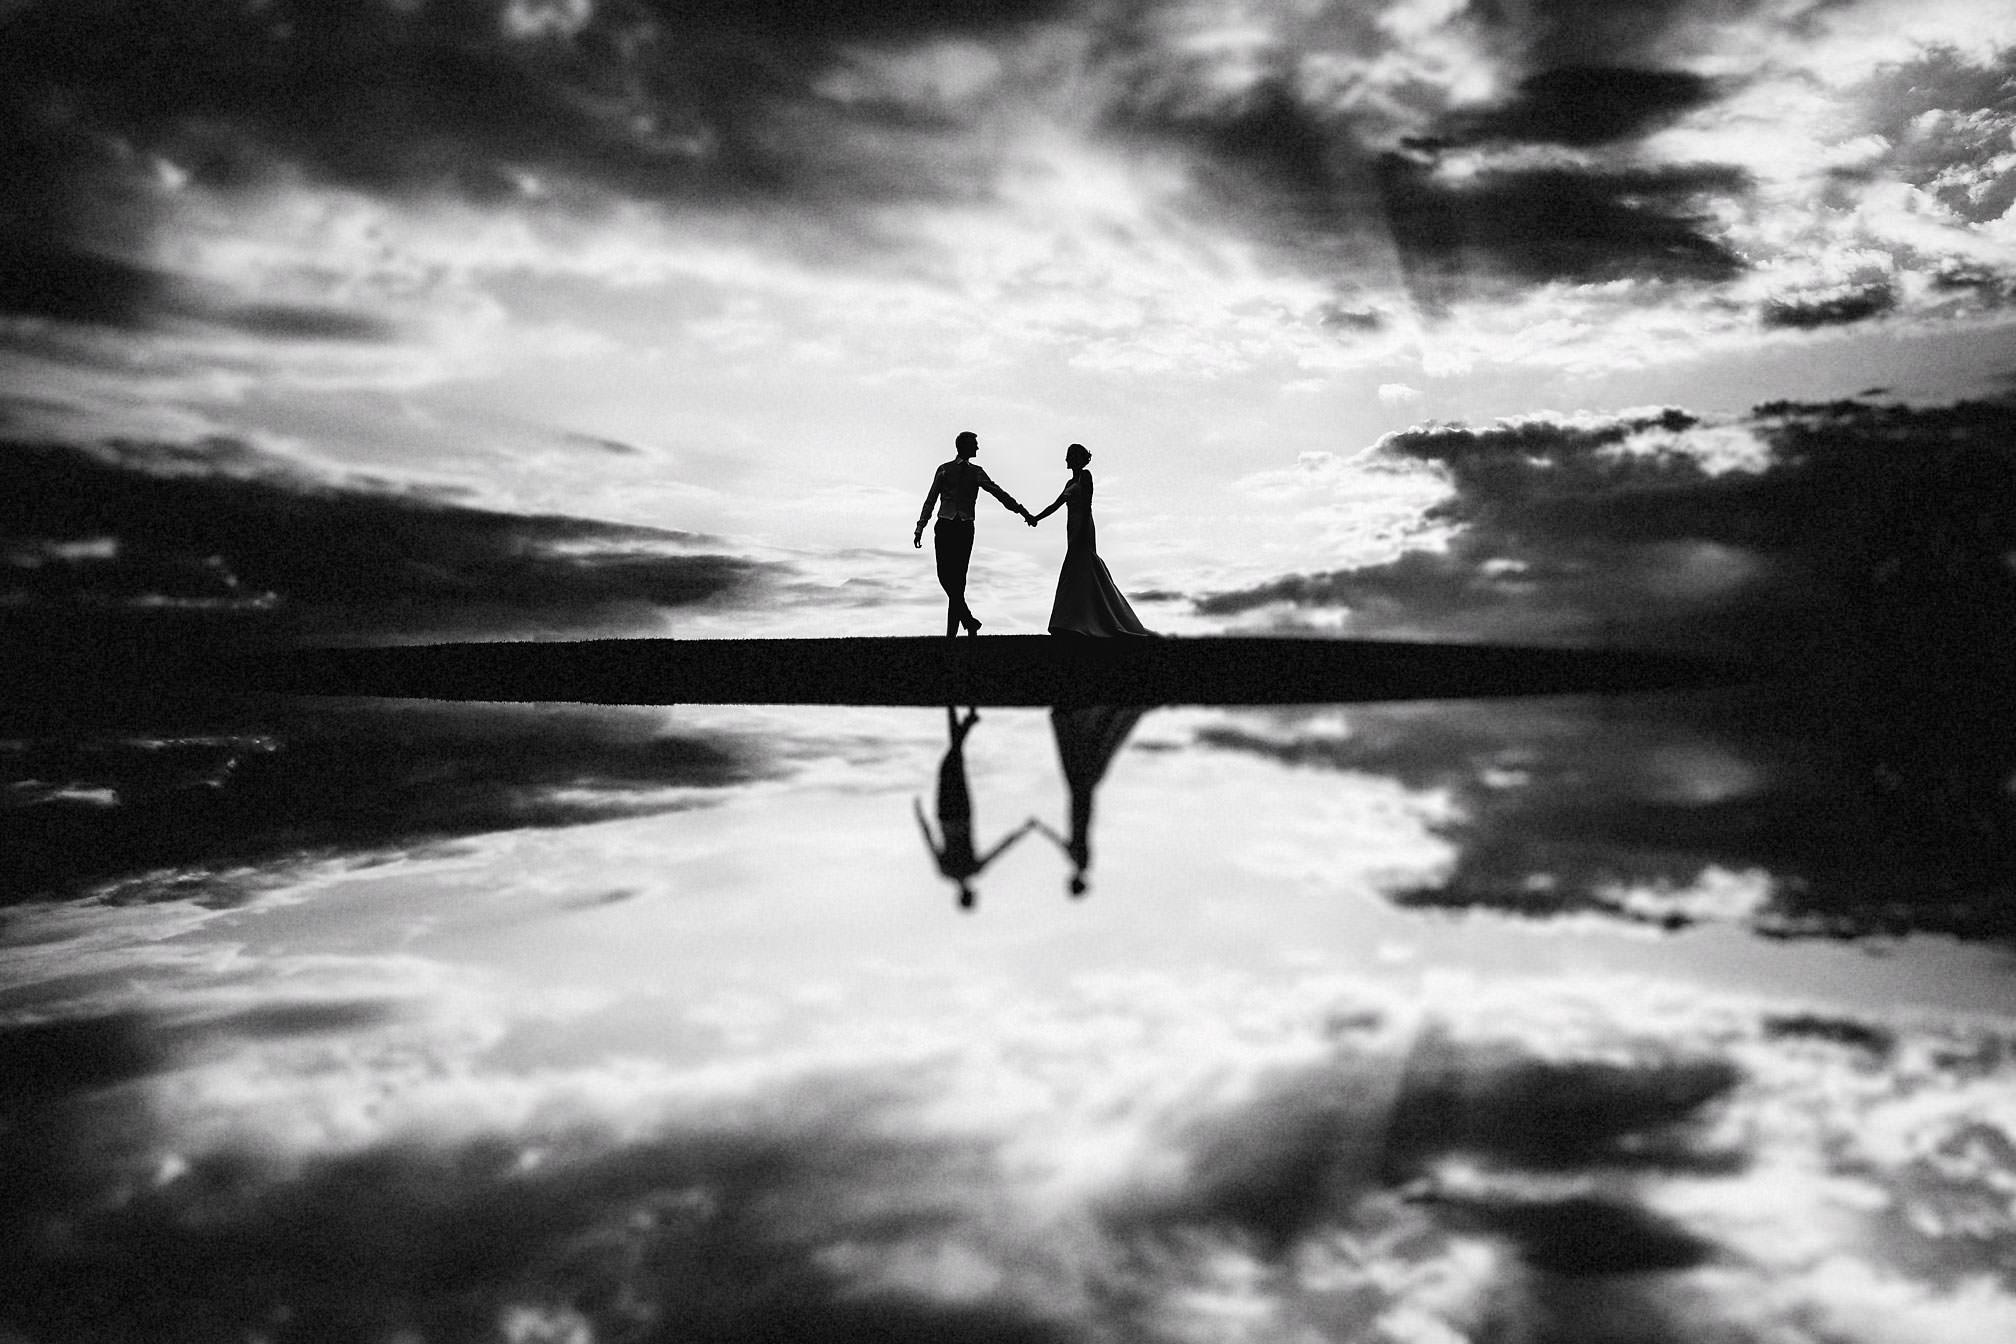 Katie & David, Reflection Silhouette Wedding Portrait